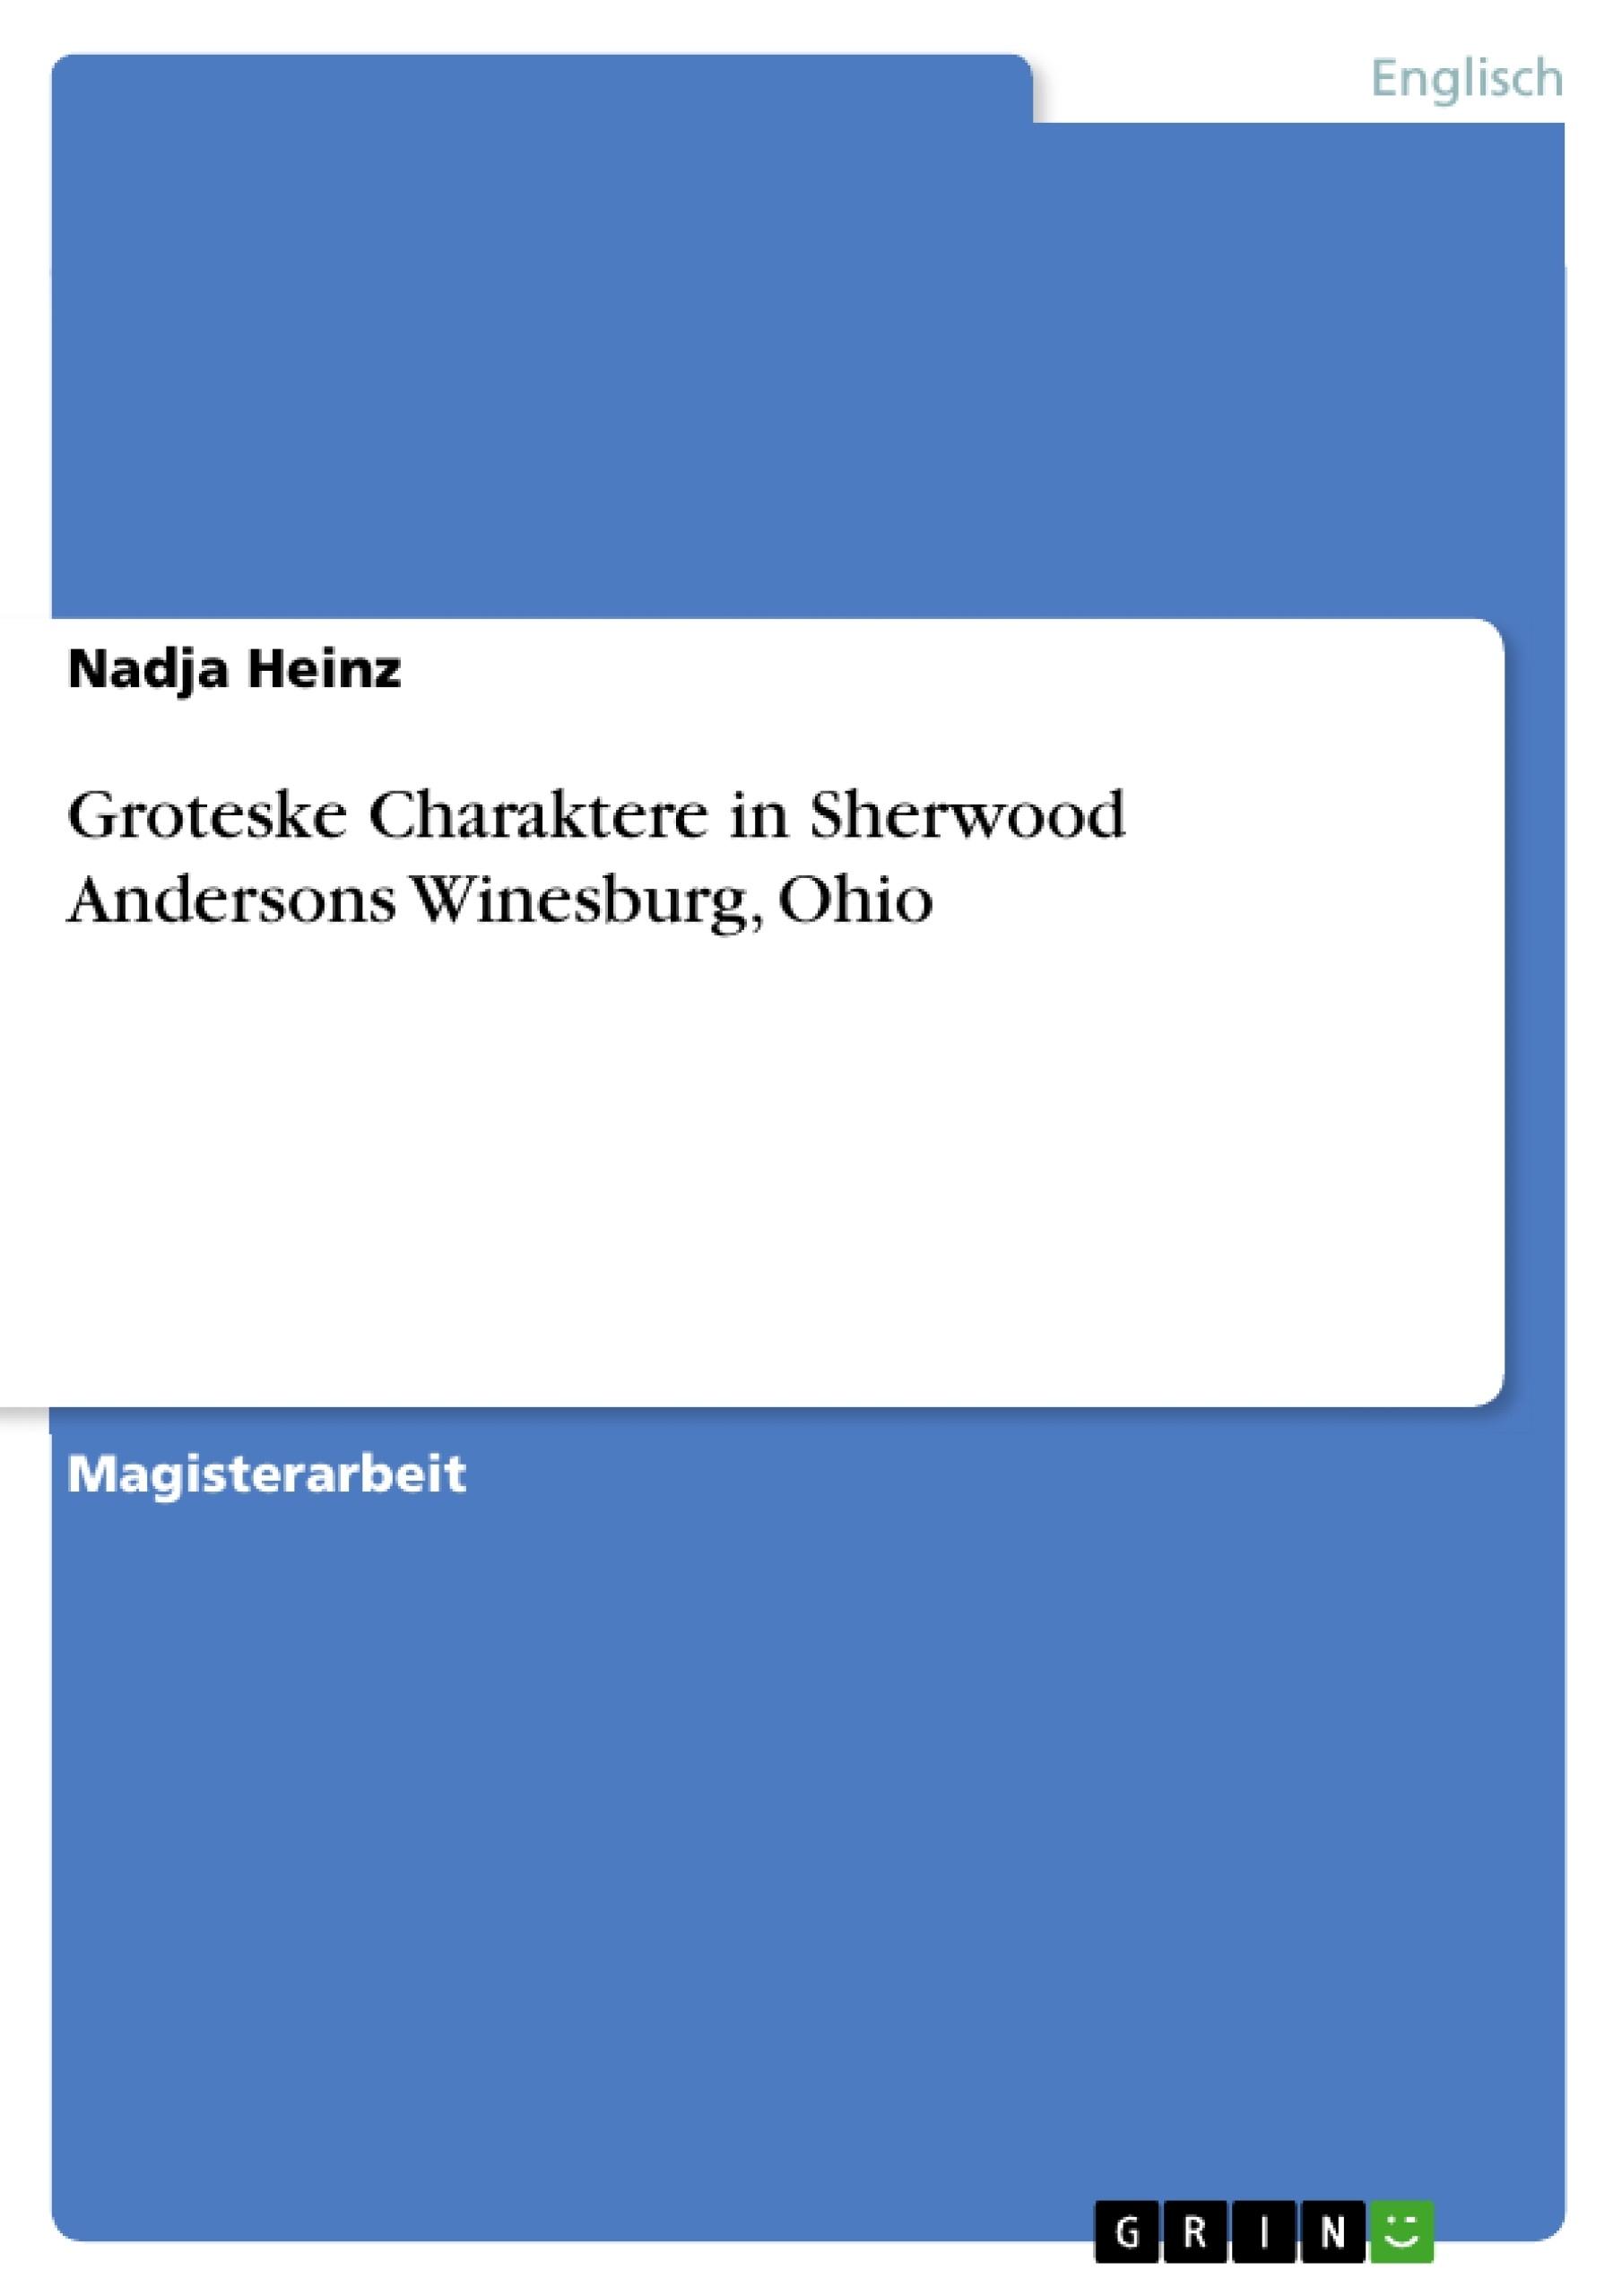 Titel: Groteske Charaktere in Sherwood Andersons Winesburg, Ohio